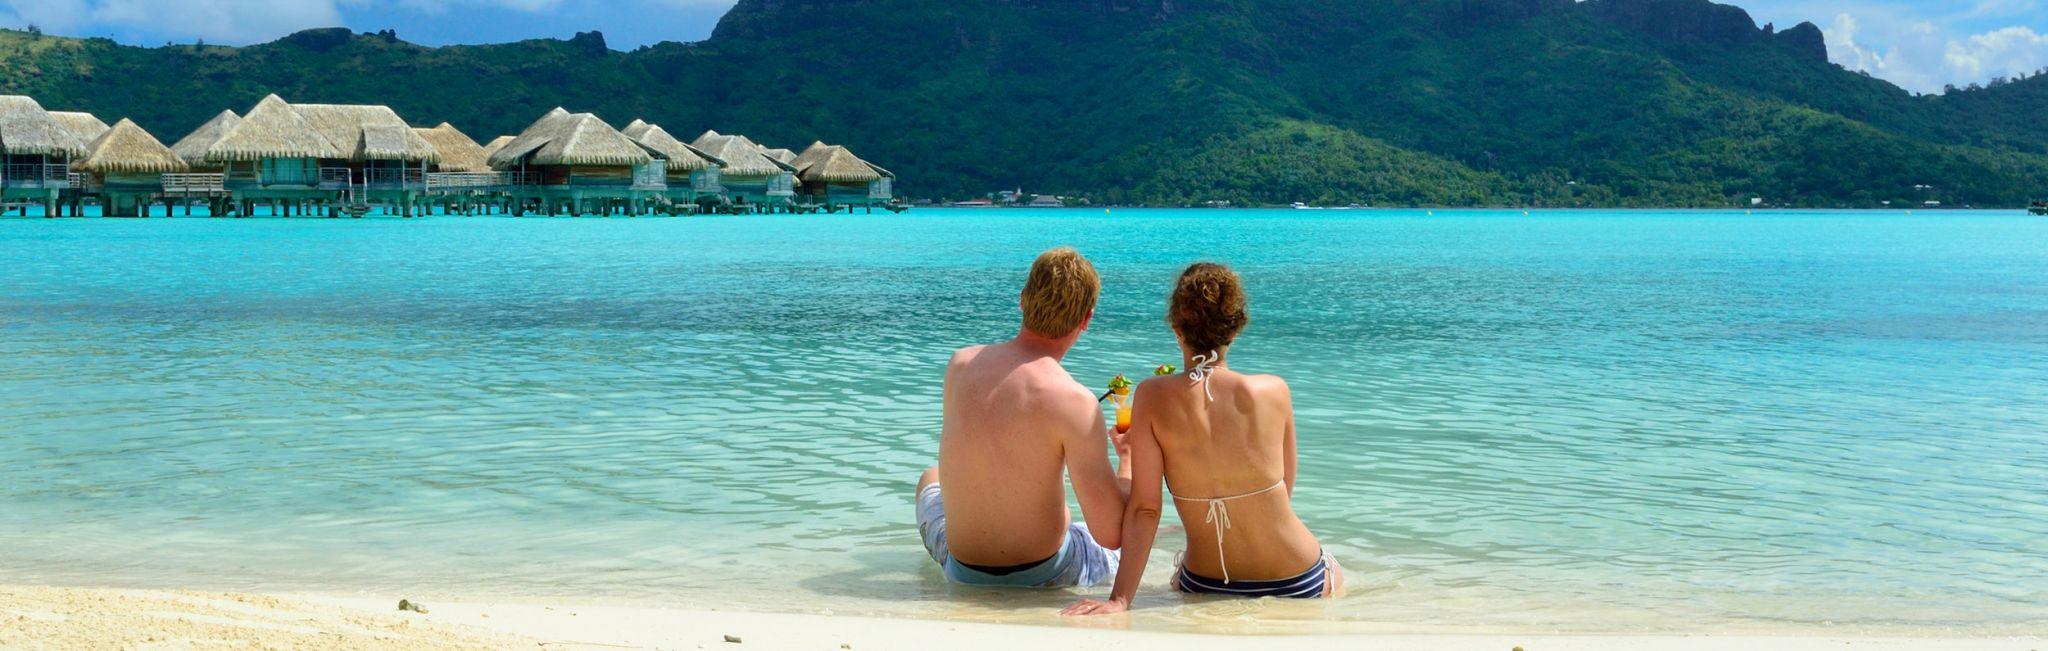 A couple relaxes on a beach in Bora Bora, Tahiti.